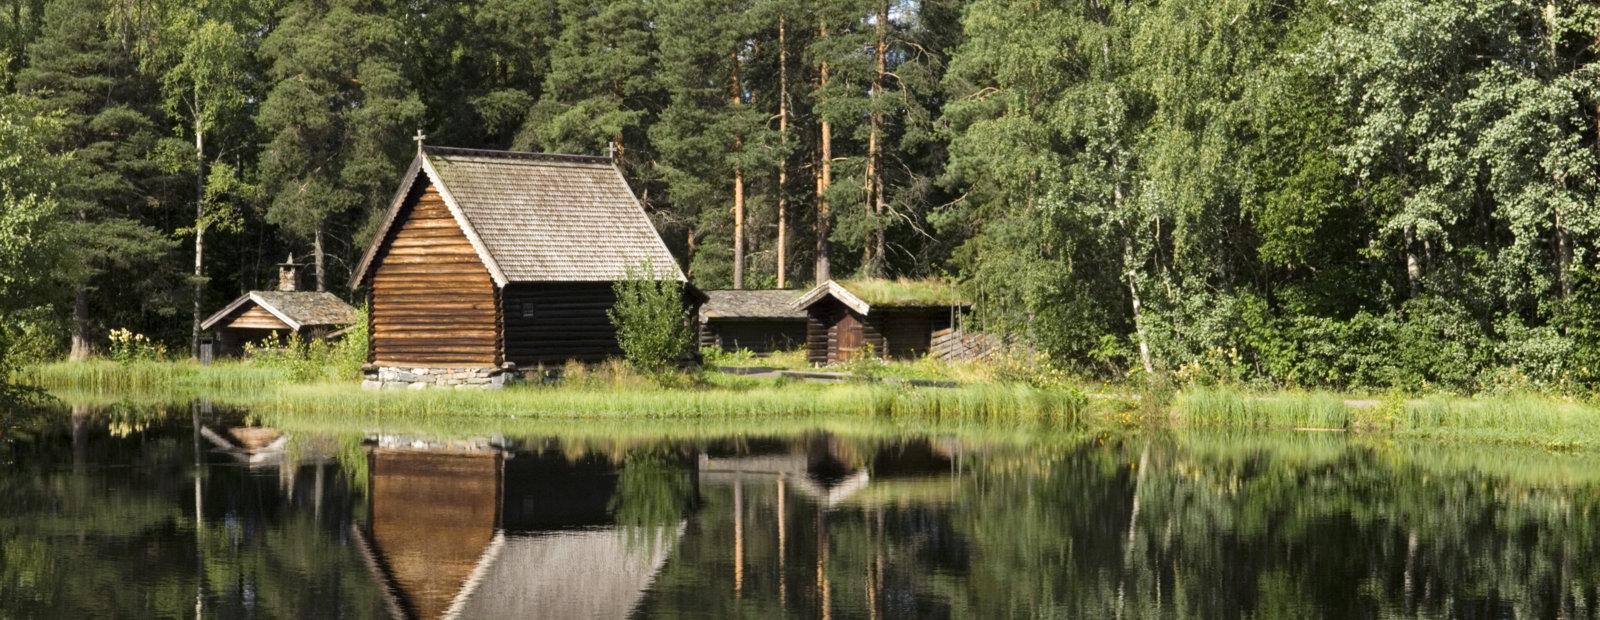 The Fishermen's Chapel at the lake Breisjøen in the open air-museum Maihaugen in Lillehammer.